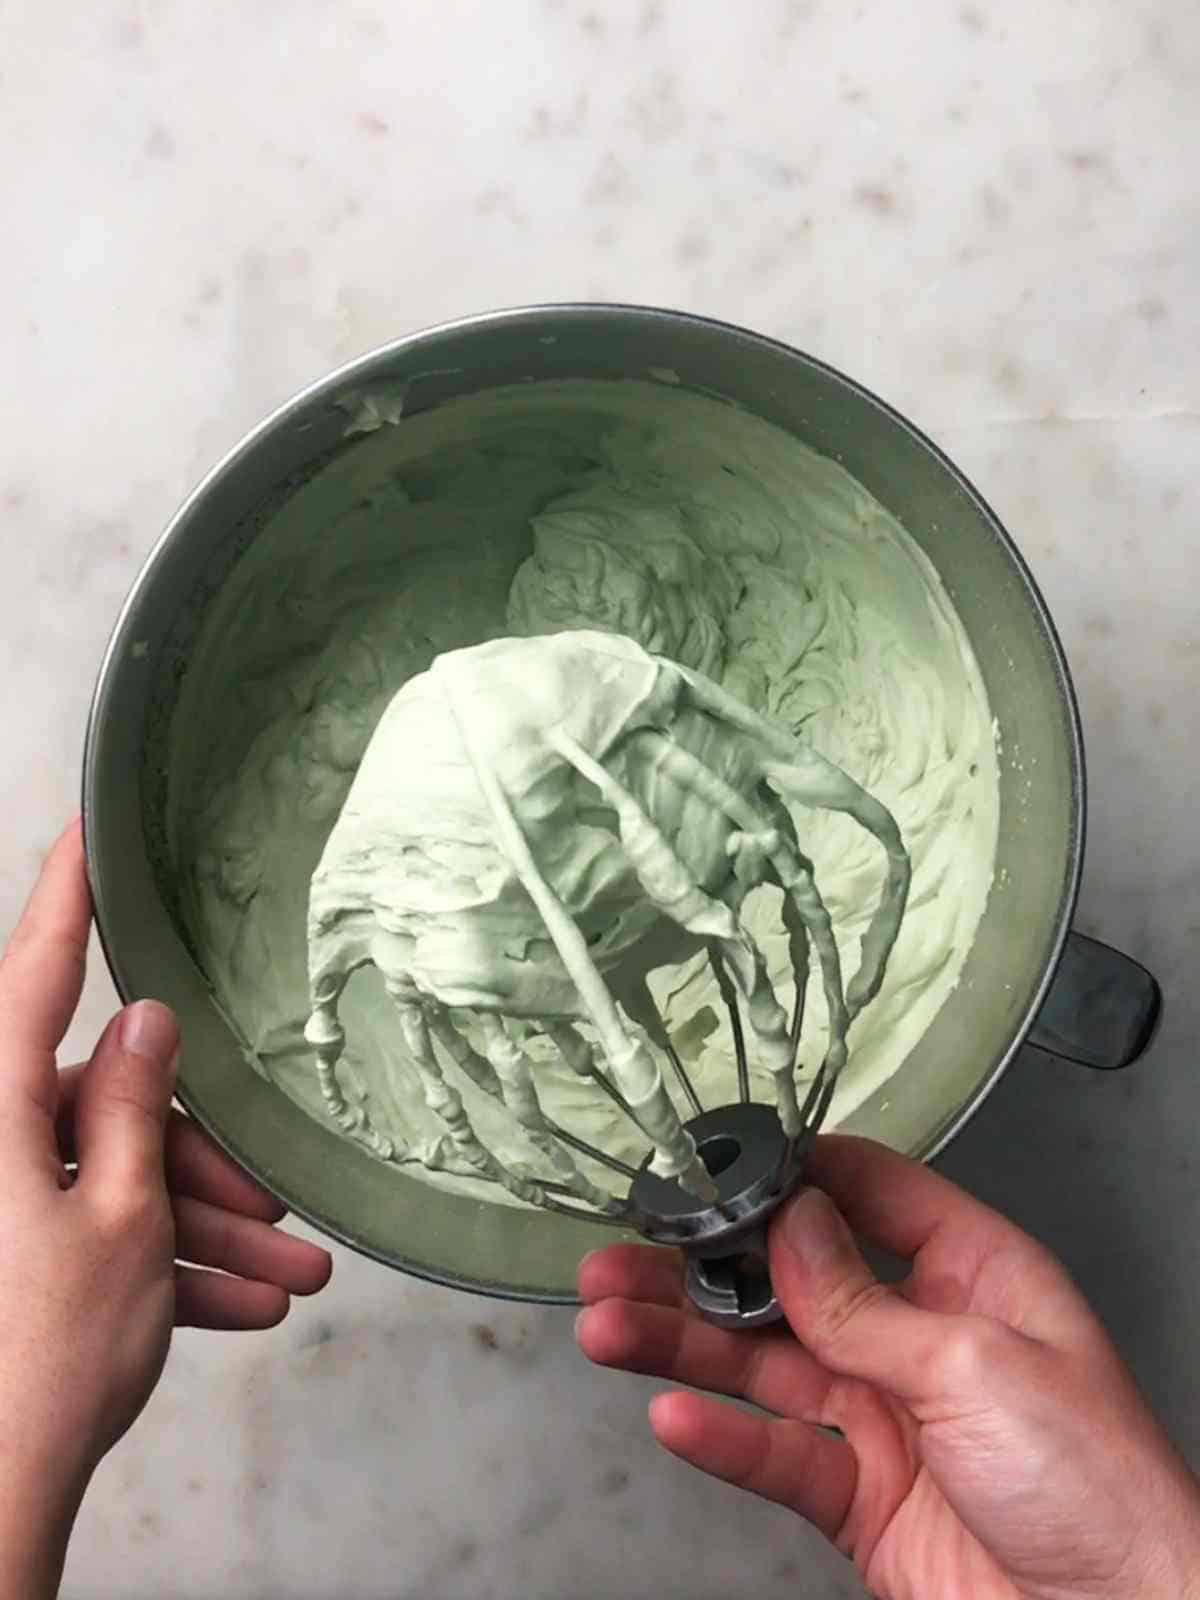 Green whipped cream.